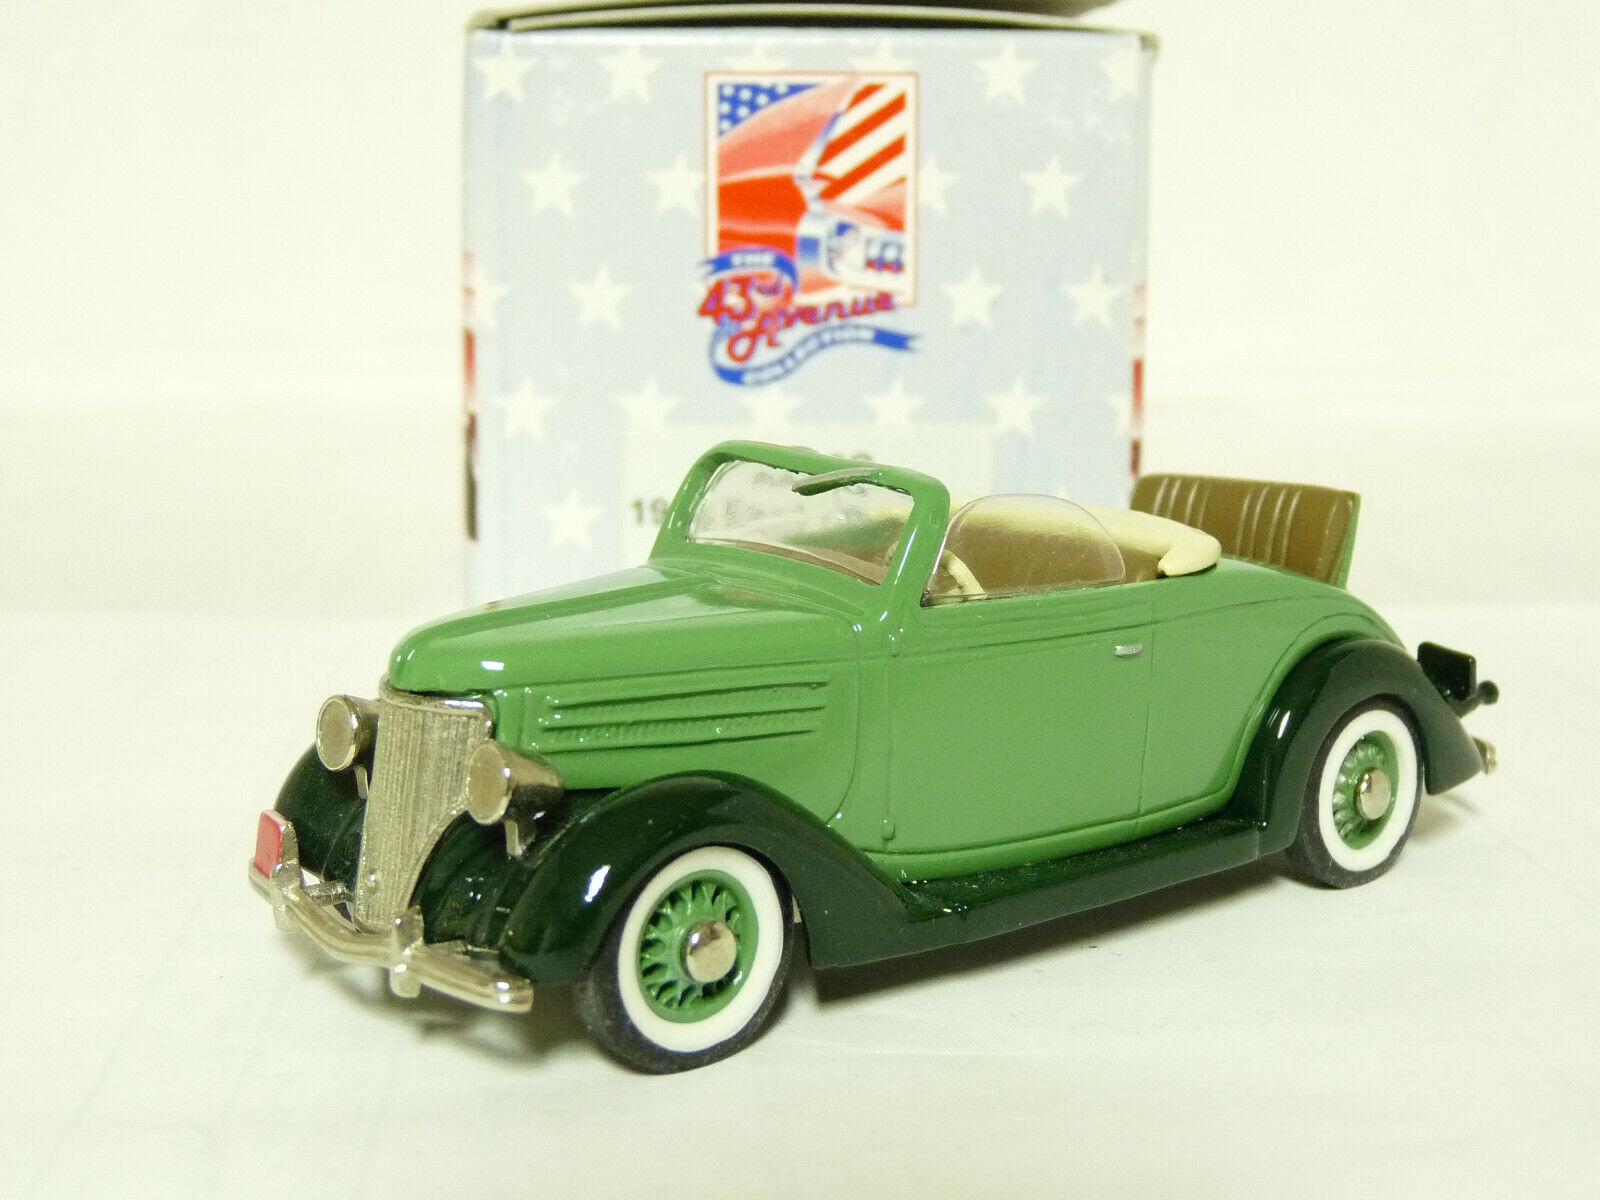 43rd Avenue Milestone AA12G 1 43 '36 Ford Congreenible Handmade White Metal Model